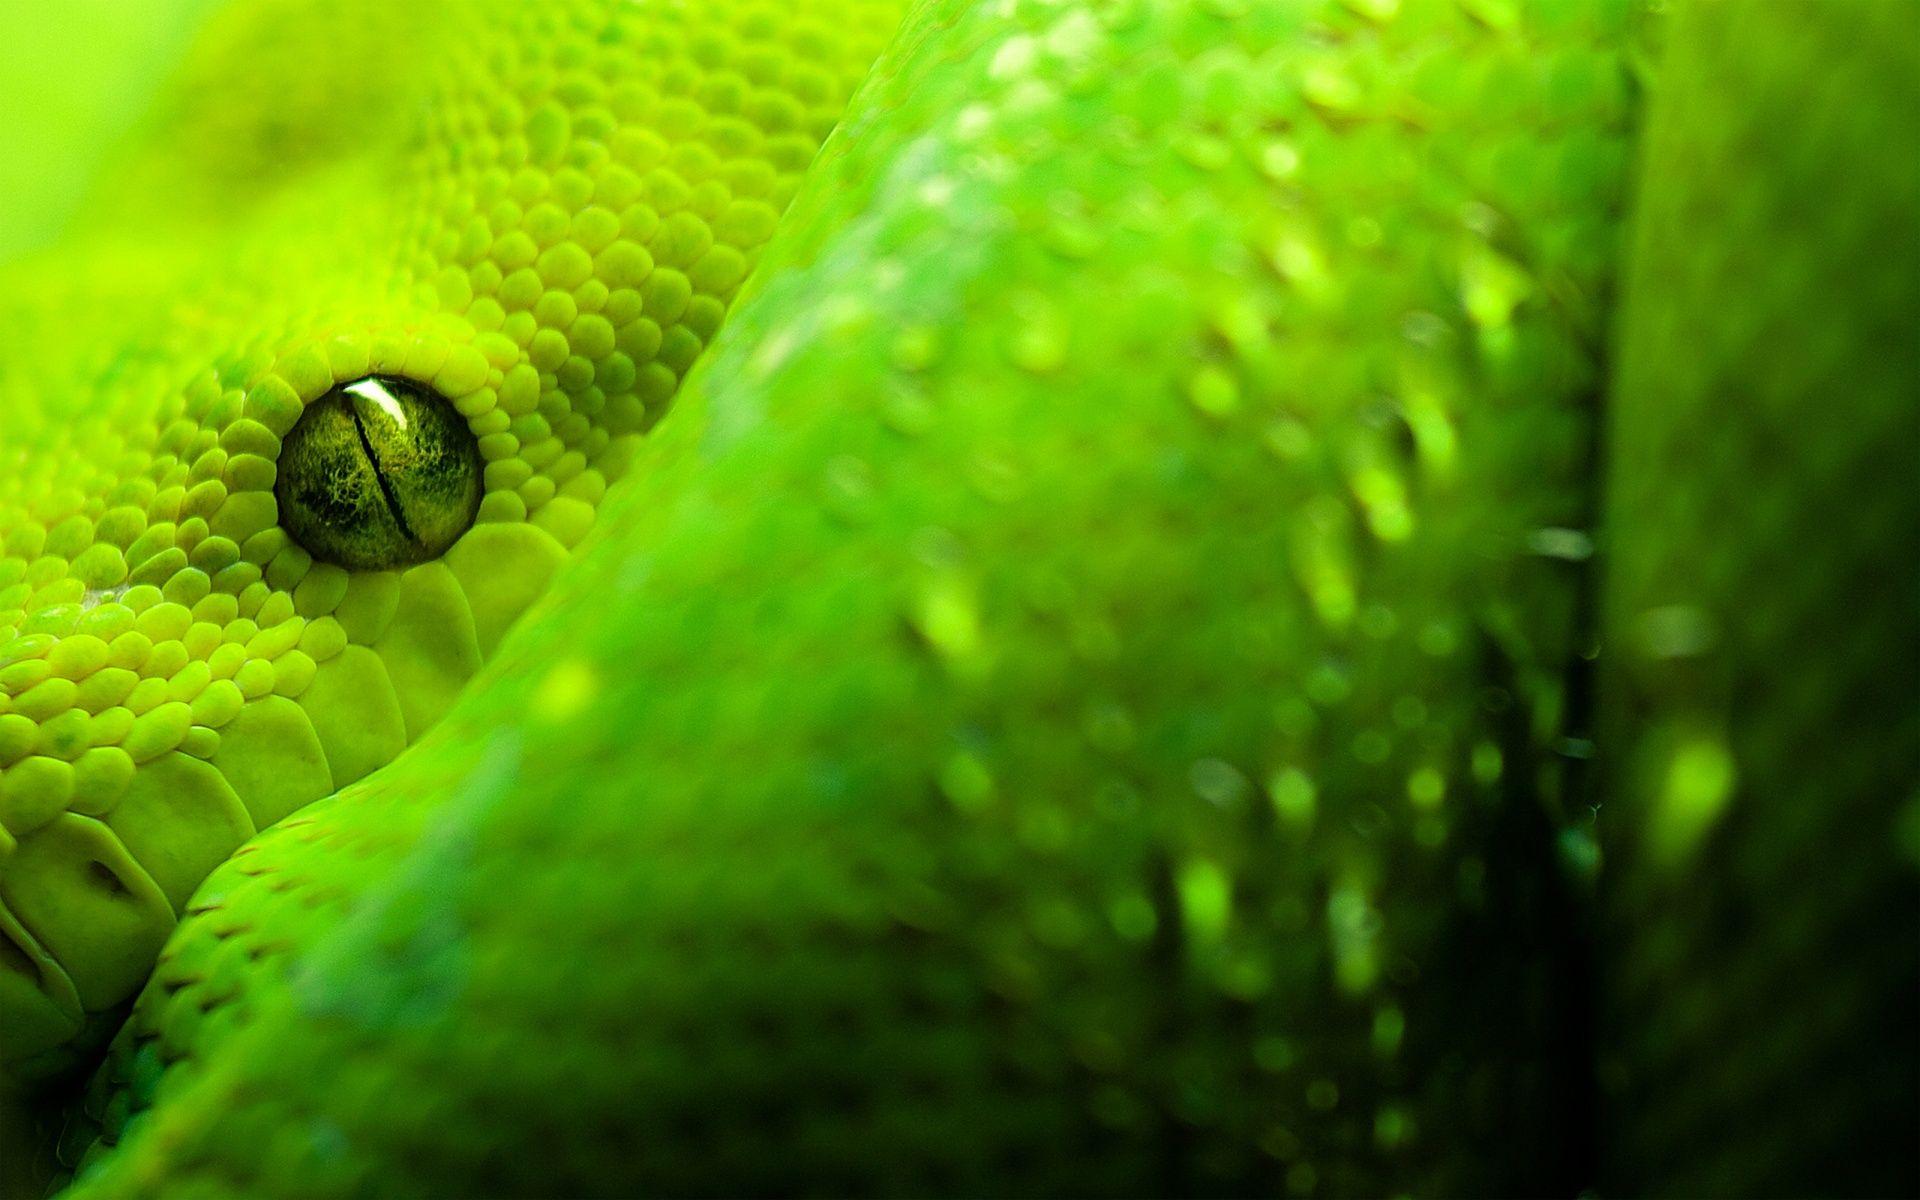 Ultra hd green snake look 1920 1200 ultra hd animals - Green snake hd wallpaper ...